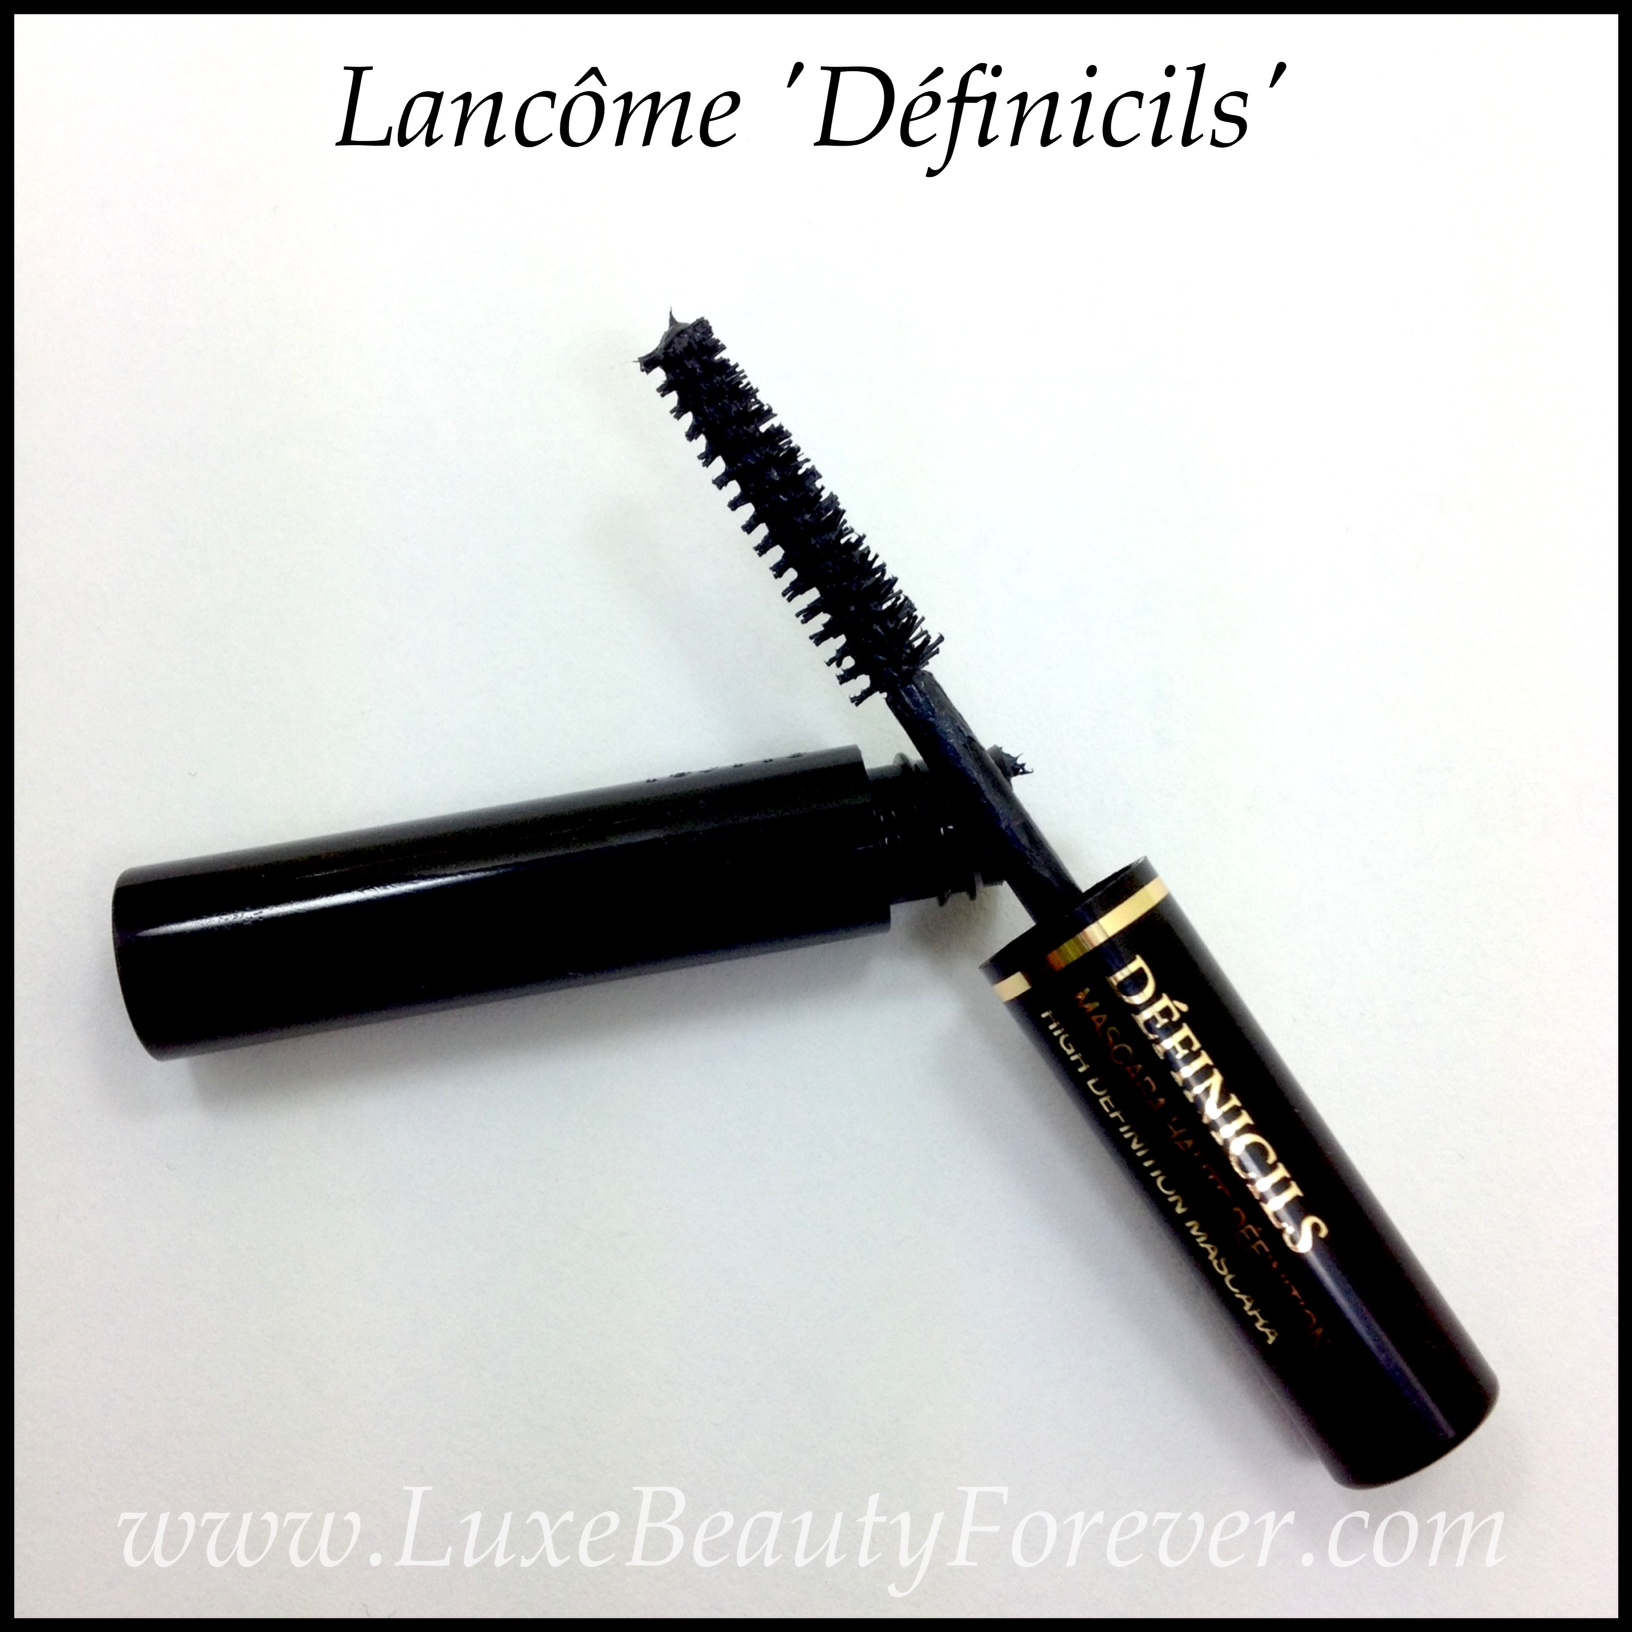 Lancôme 'Définicils' & 'Hypnôse' Mascara + 'Cils Booster XL' Base ...